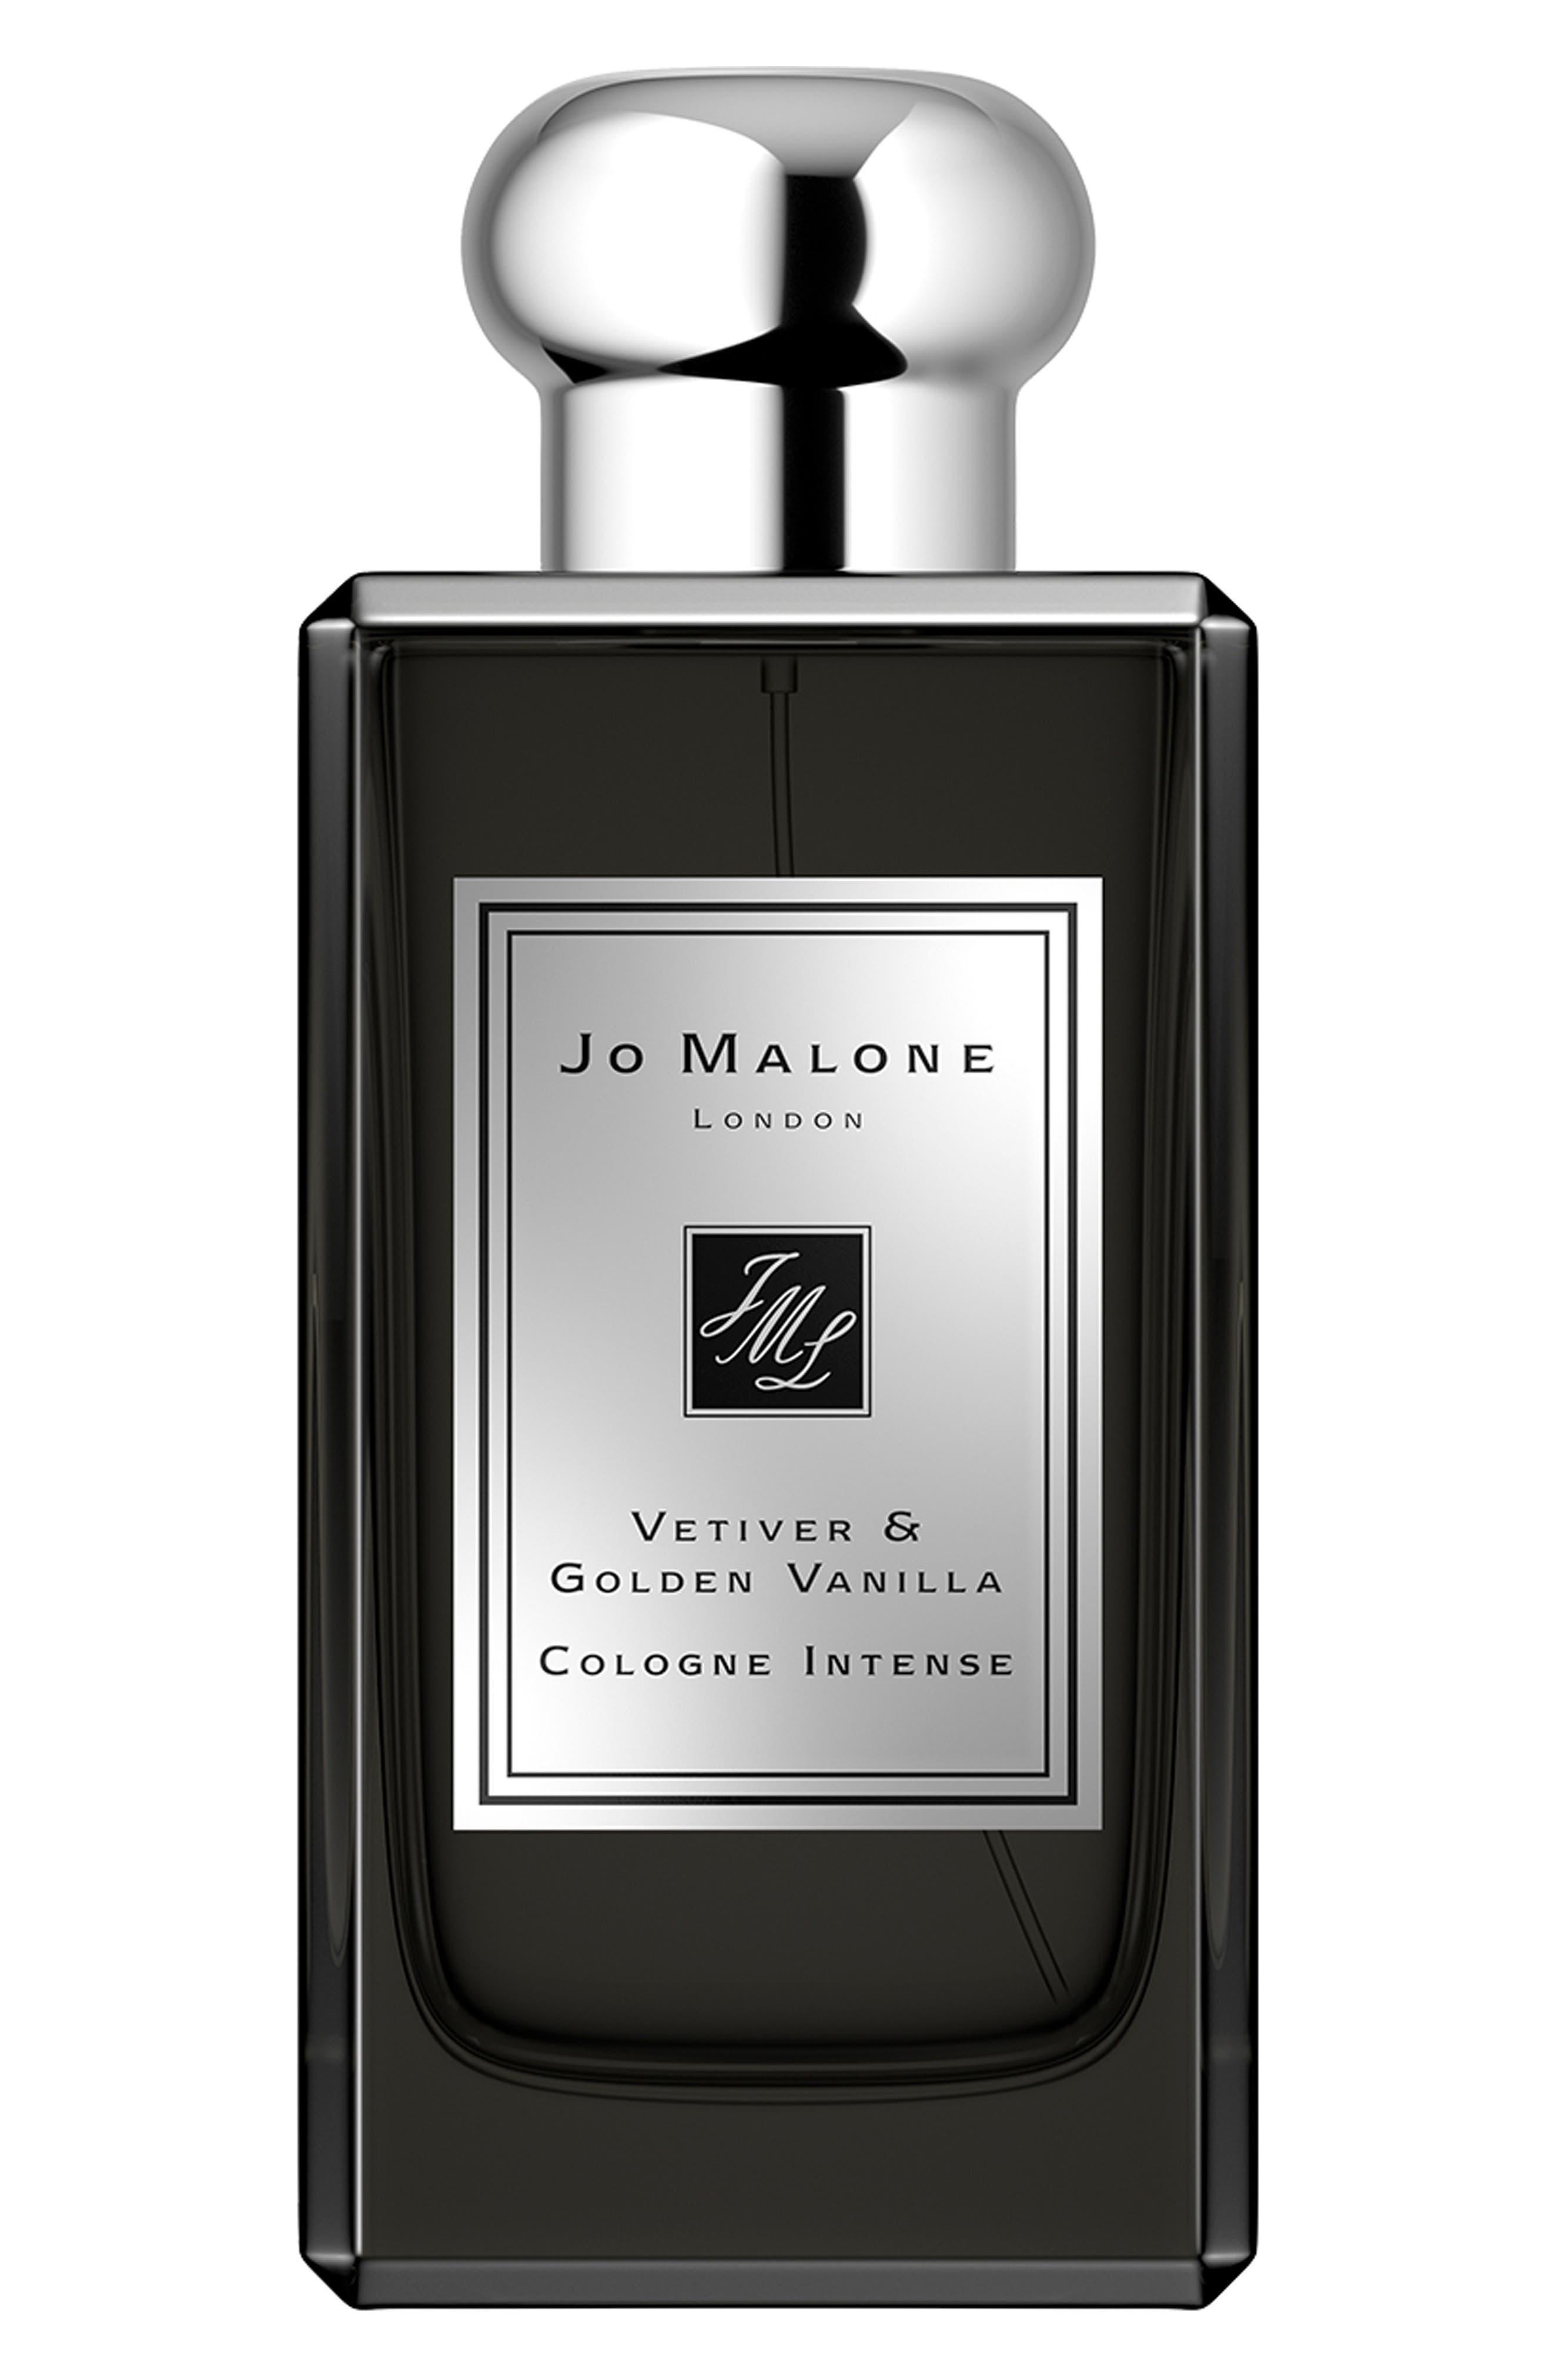 Jo Malone London(TM) Vetiver & Golden Vanilla Cologne Intense